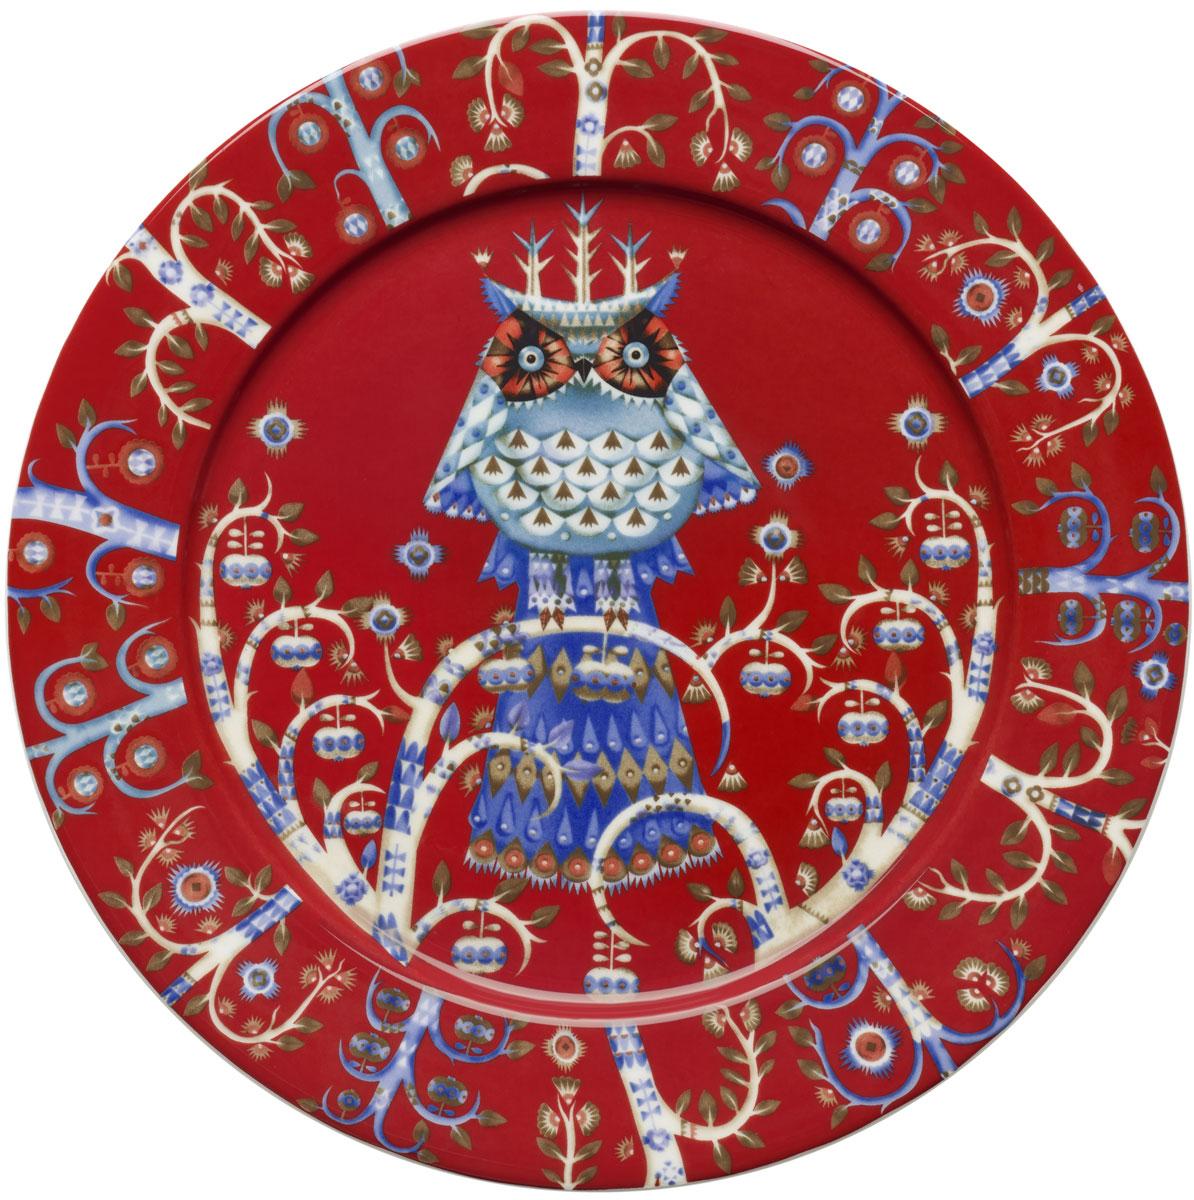 Тарелка Iittala Taika, цвет: красный, диаметр 27 см1013907